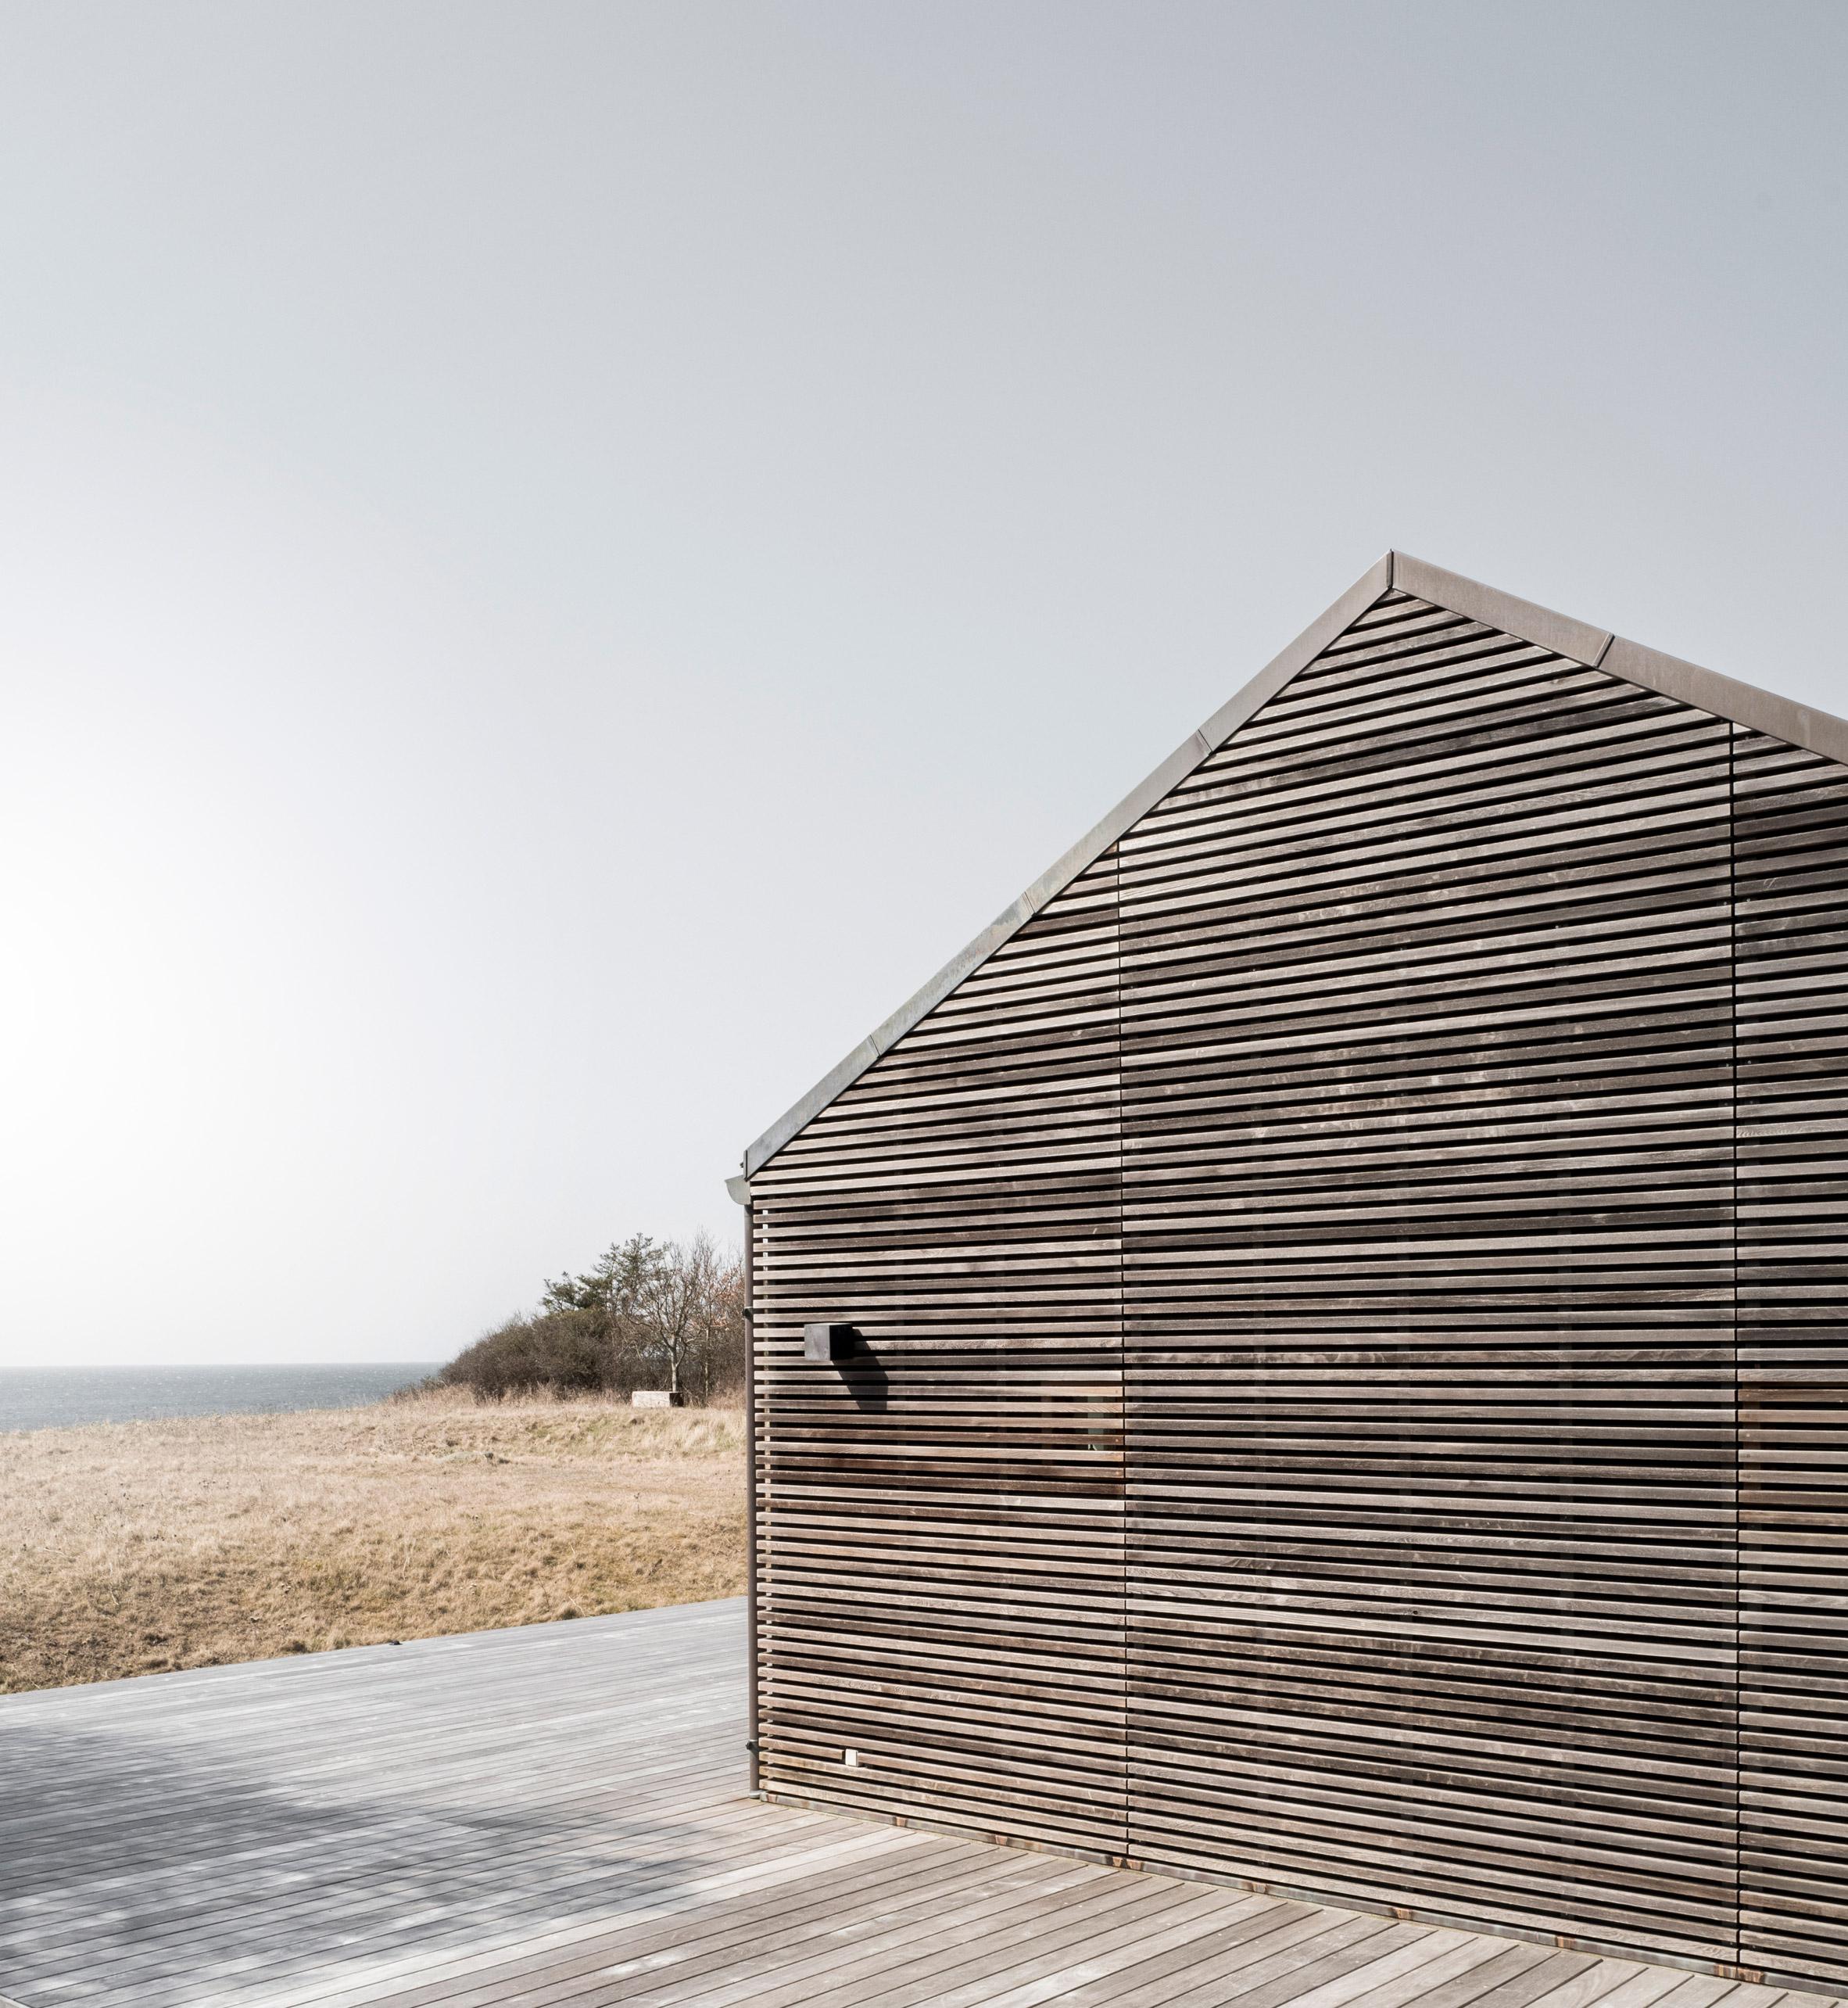 seaside-abode-norm-architects-denmark-aprilandmay-1.jpg